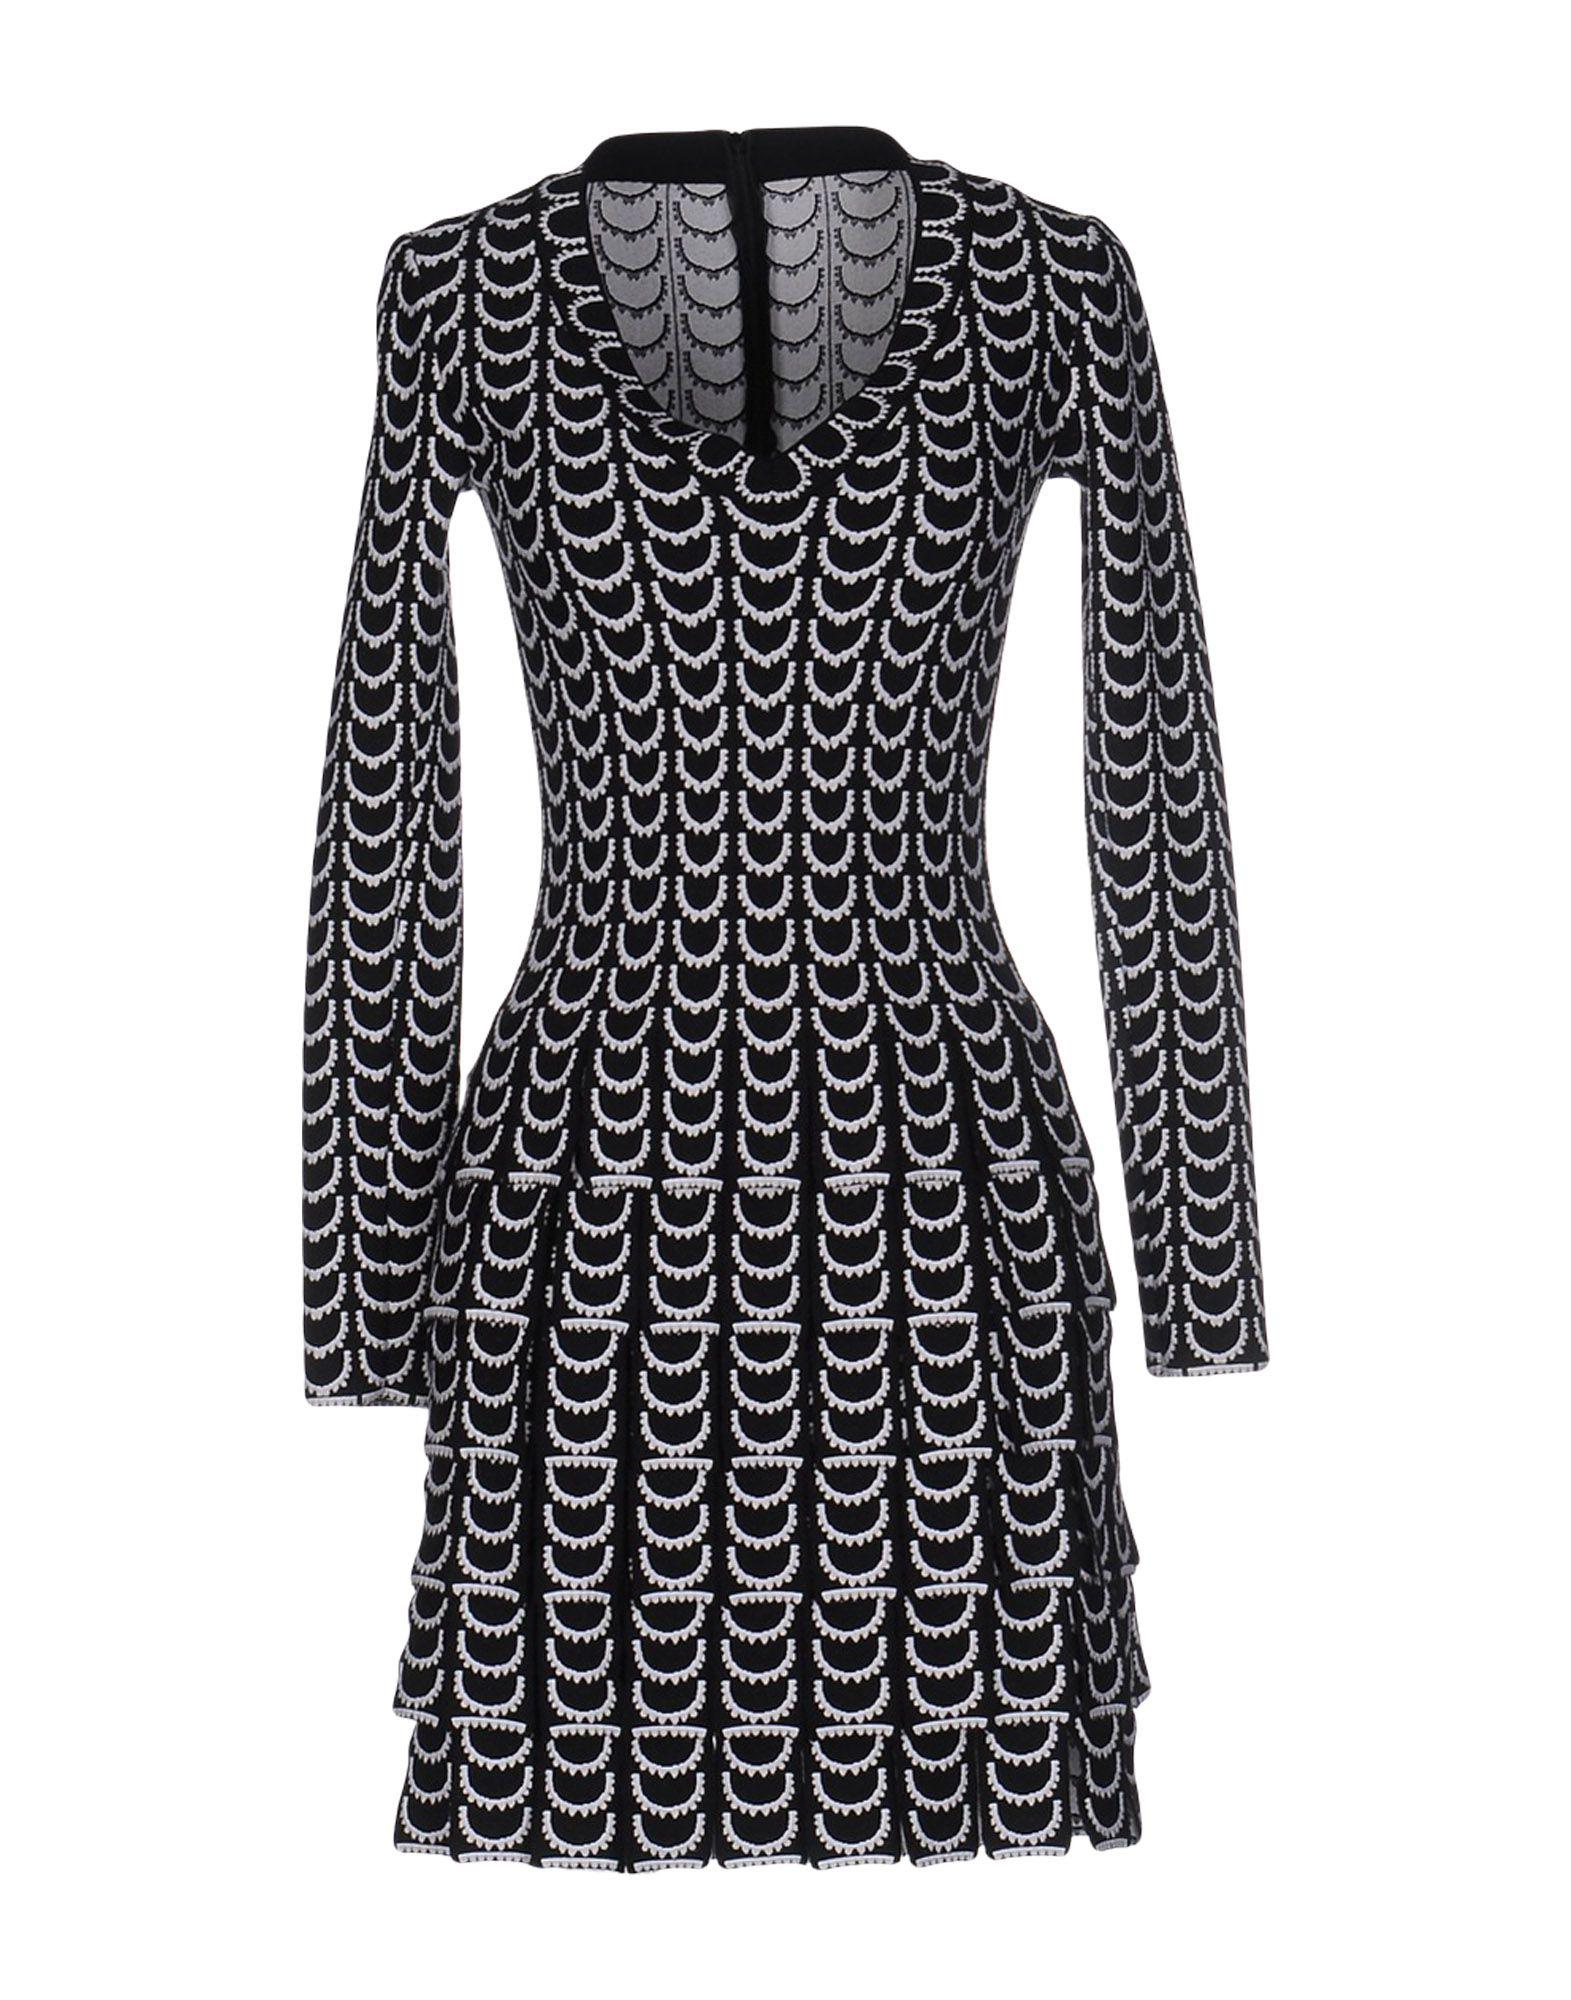 ALAÏA Короткое платье платье футляр